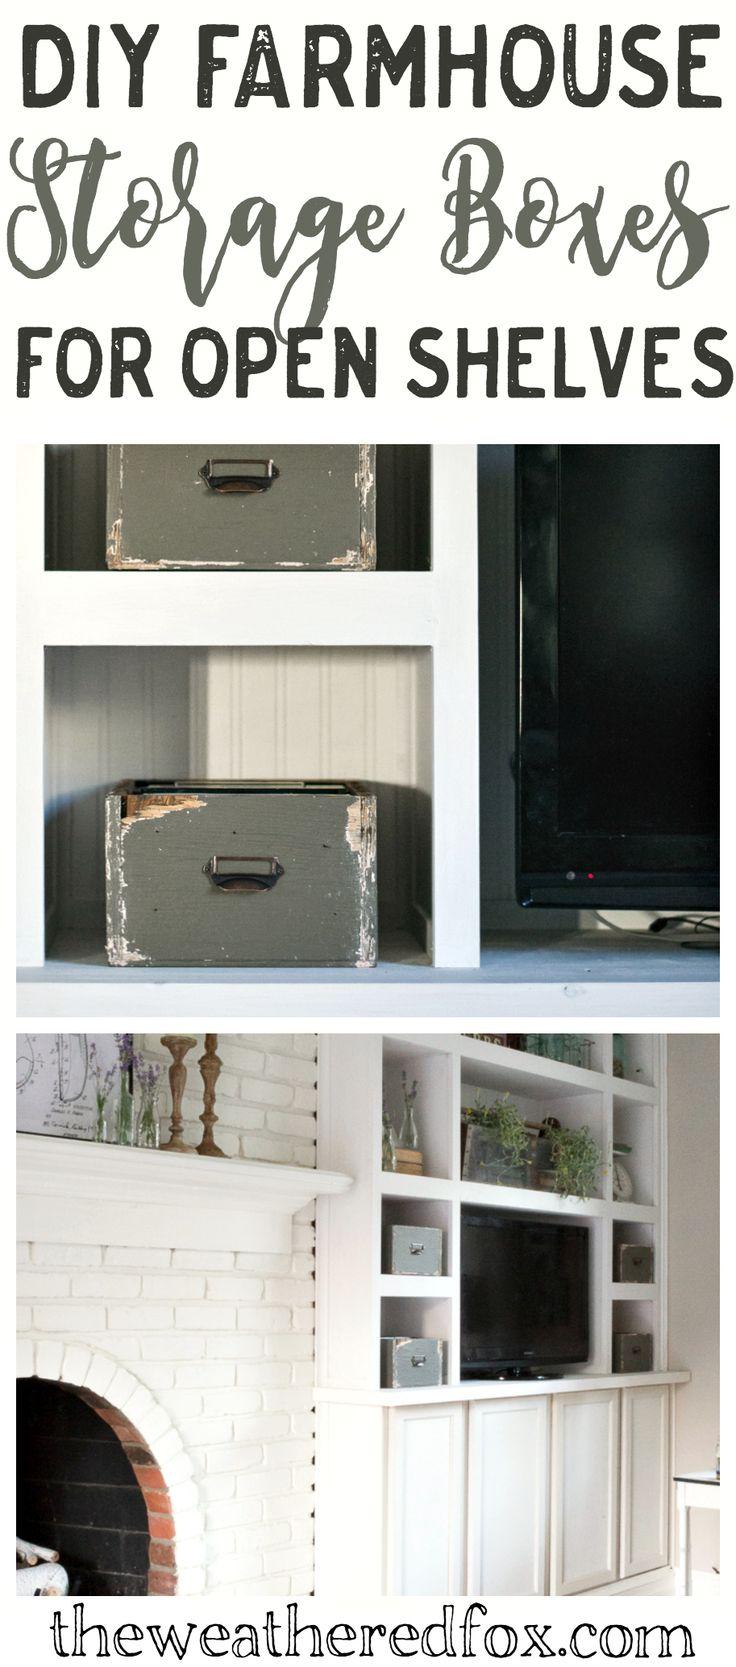 How to make farmhouse storage boxes for open shelves.